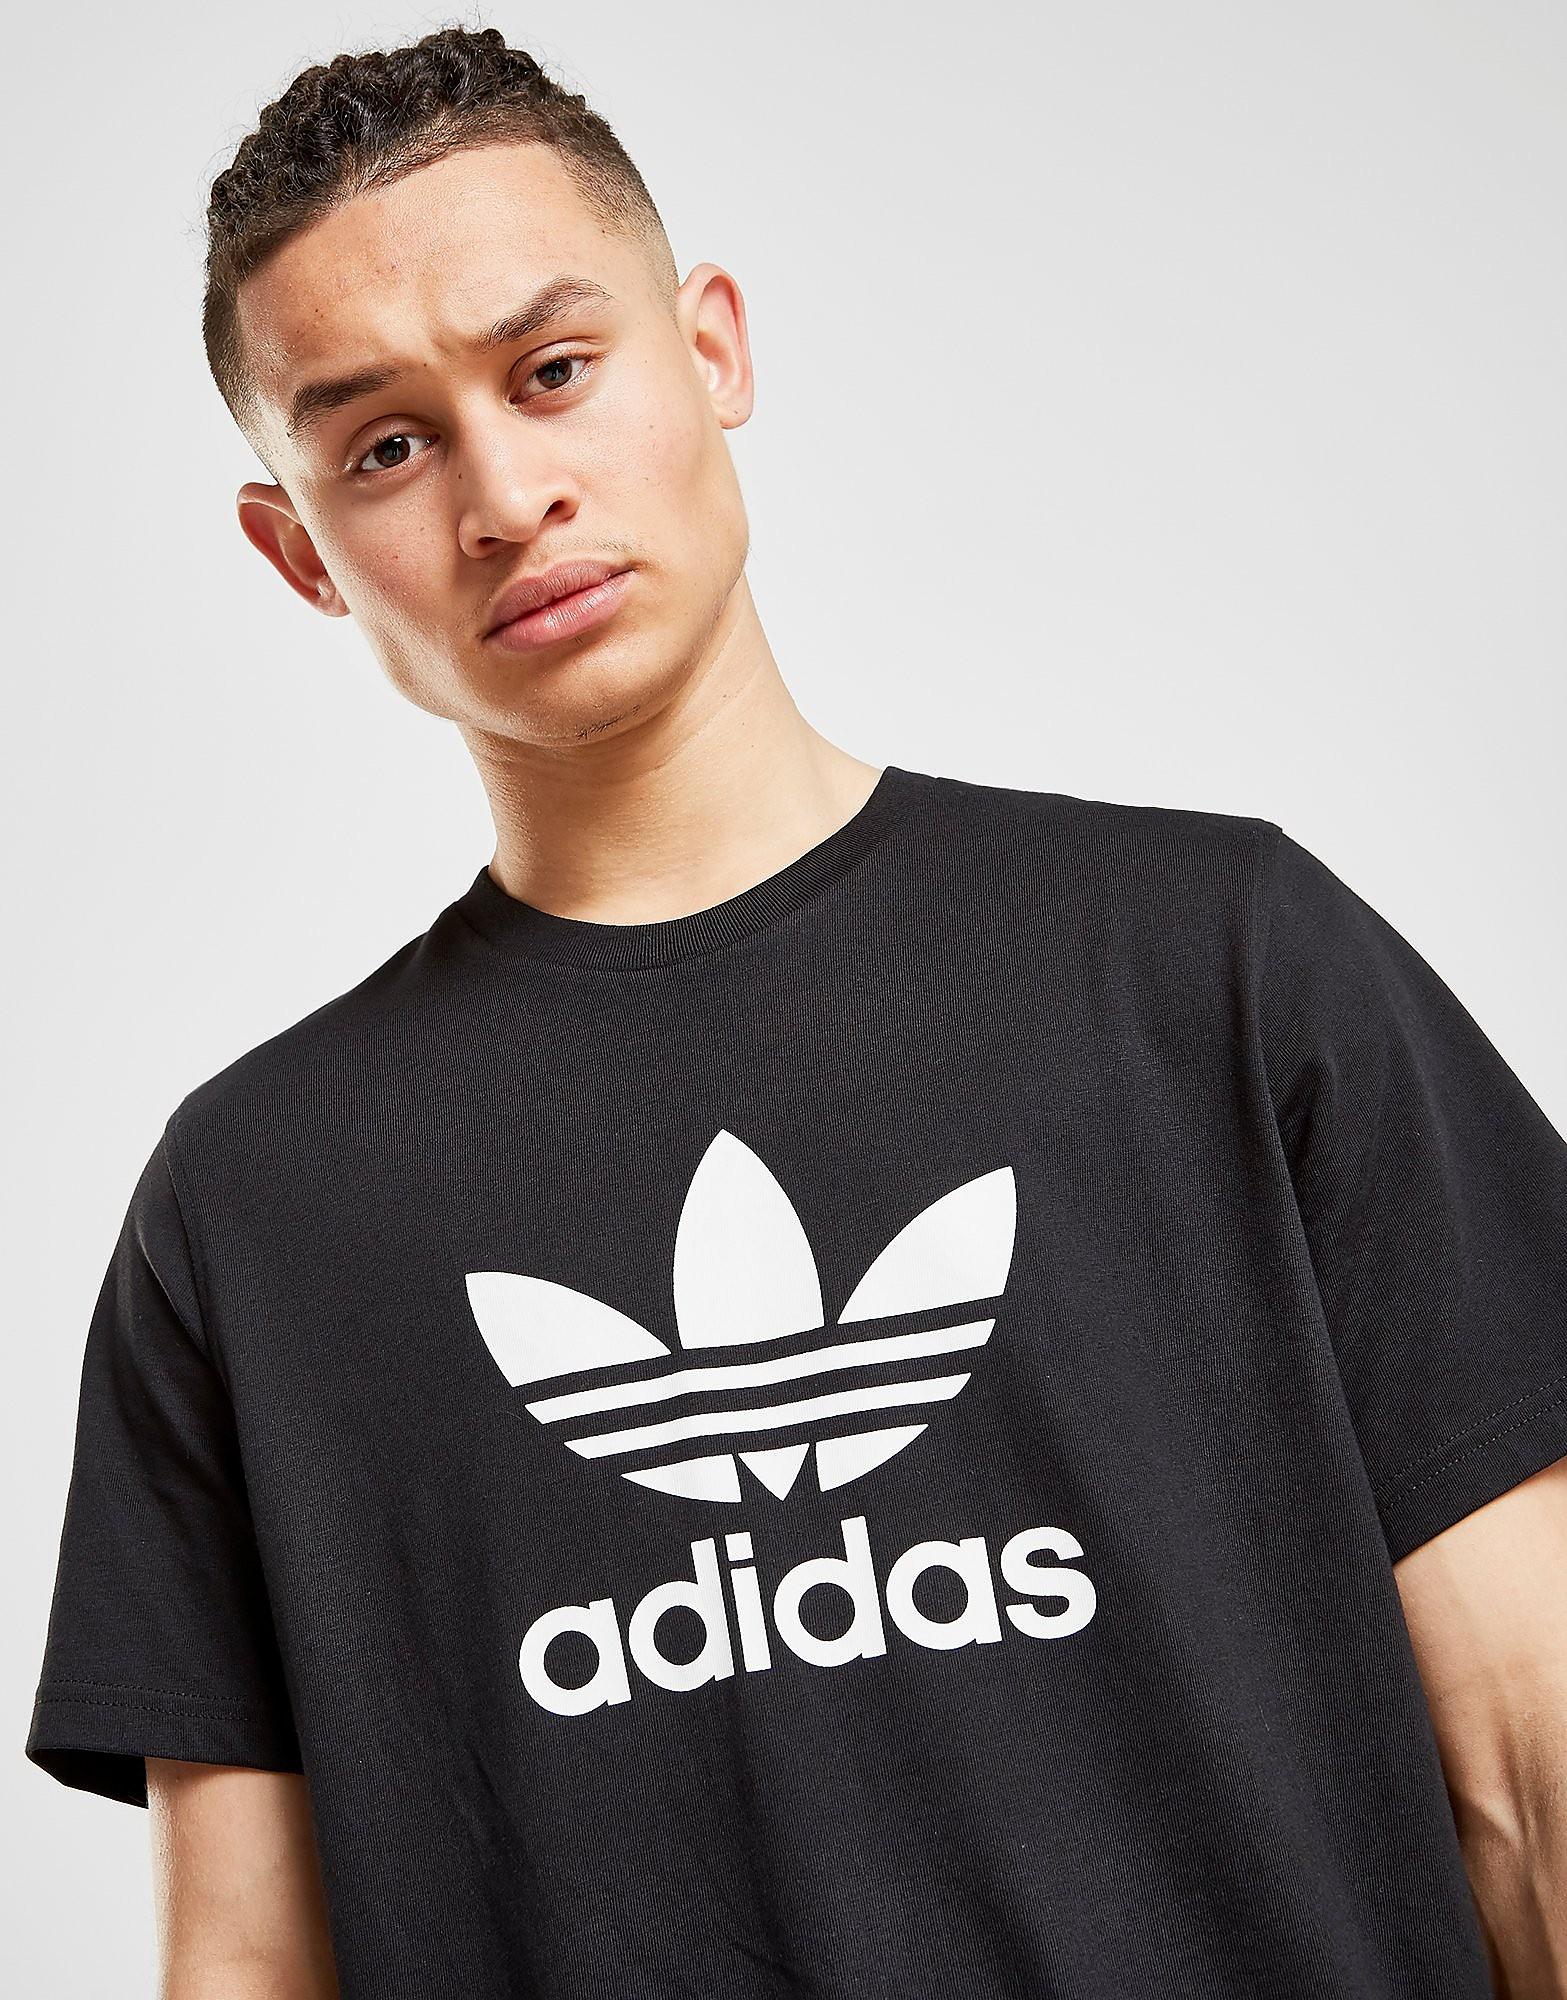 adidas Originals Trefoil State T-Shirt